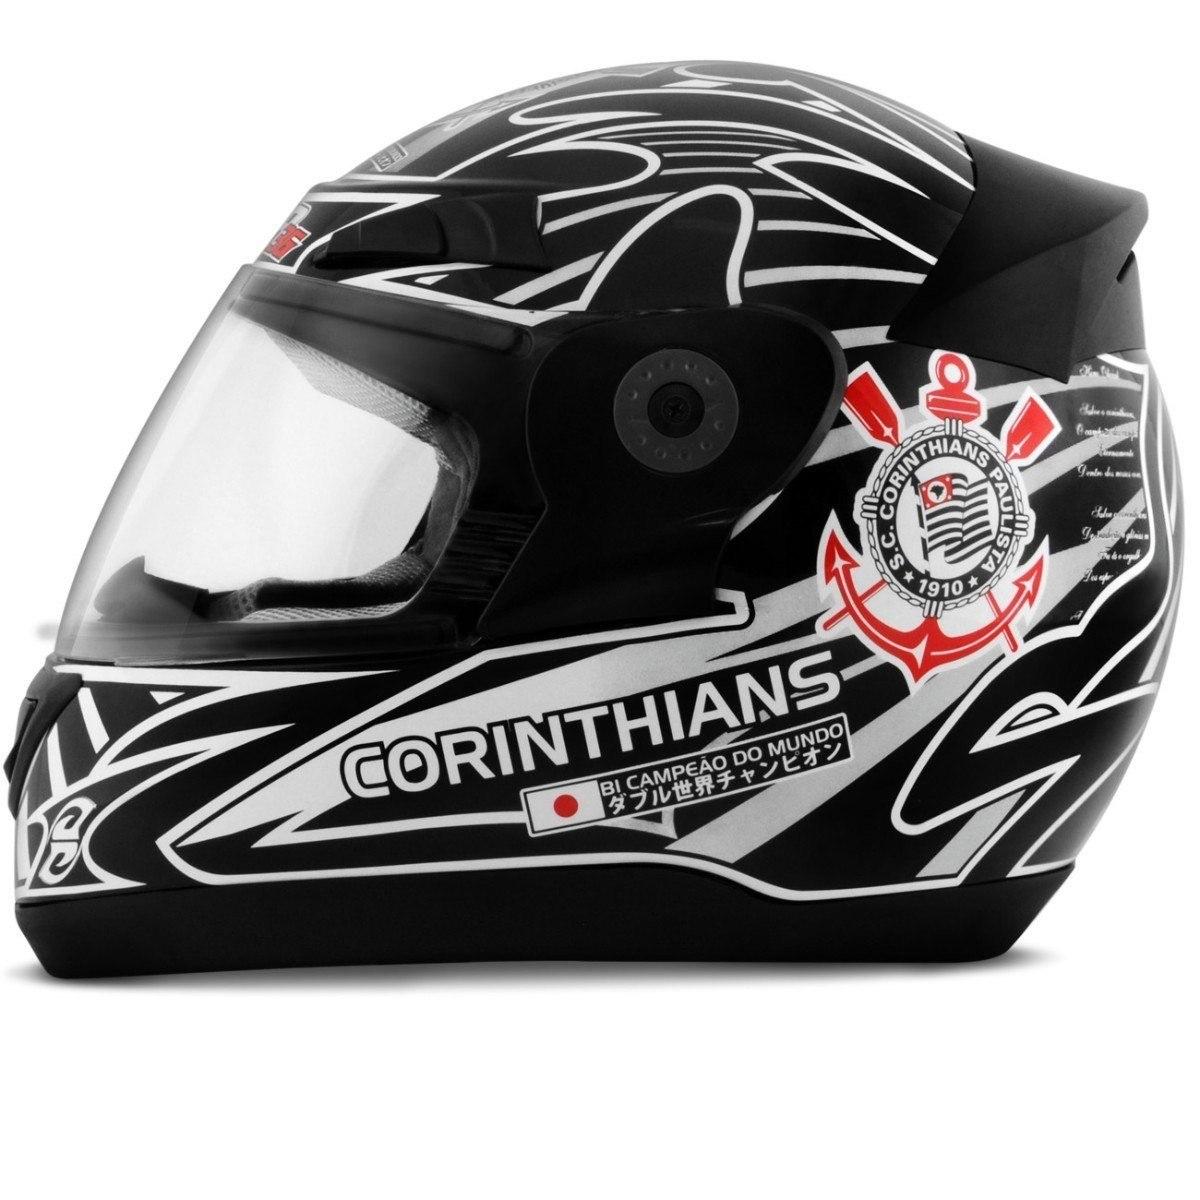 novo capacete protork evolution 3g corinthians futebol clube. Carregando  zoom. ec10a7ae6d57a